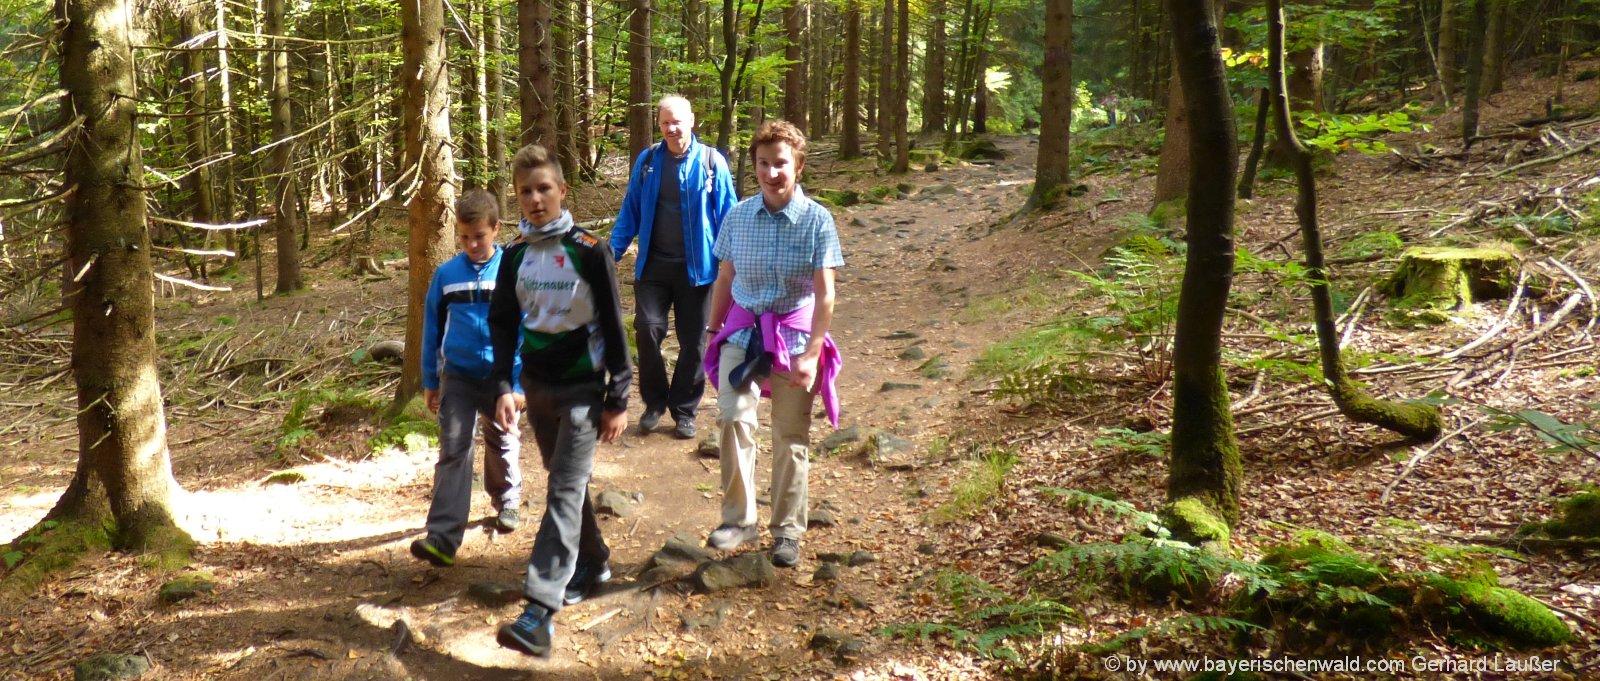 familien-wanderurlaub-bayersicher-wald-hoher-bogen-bergwanderung